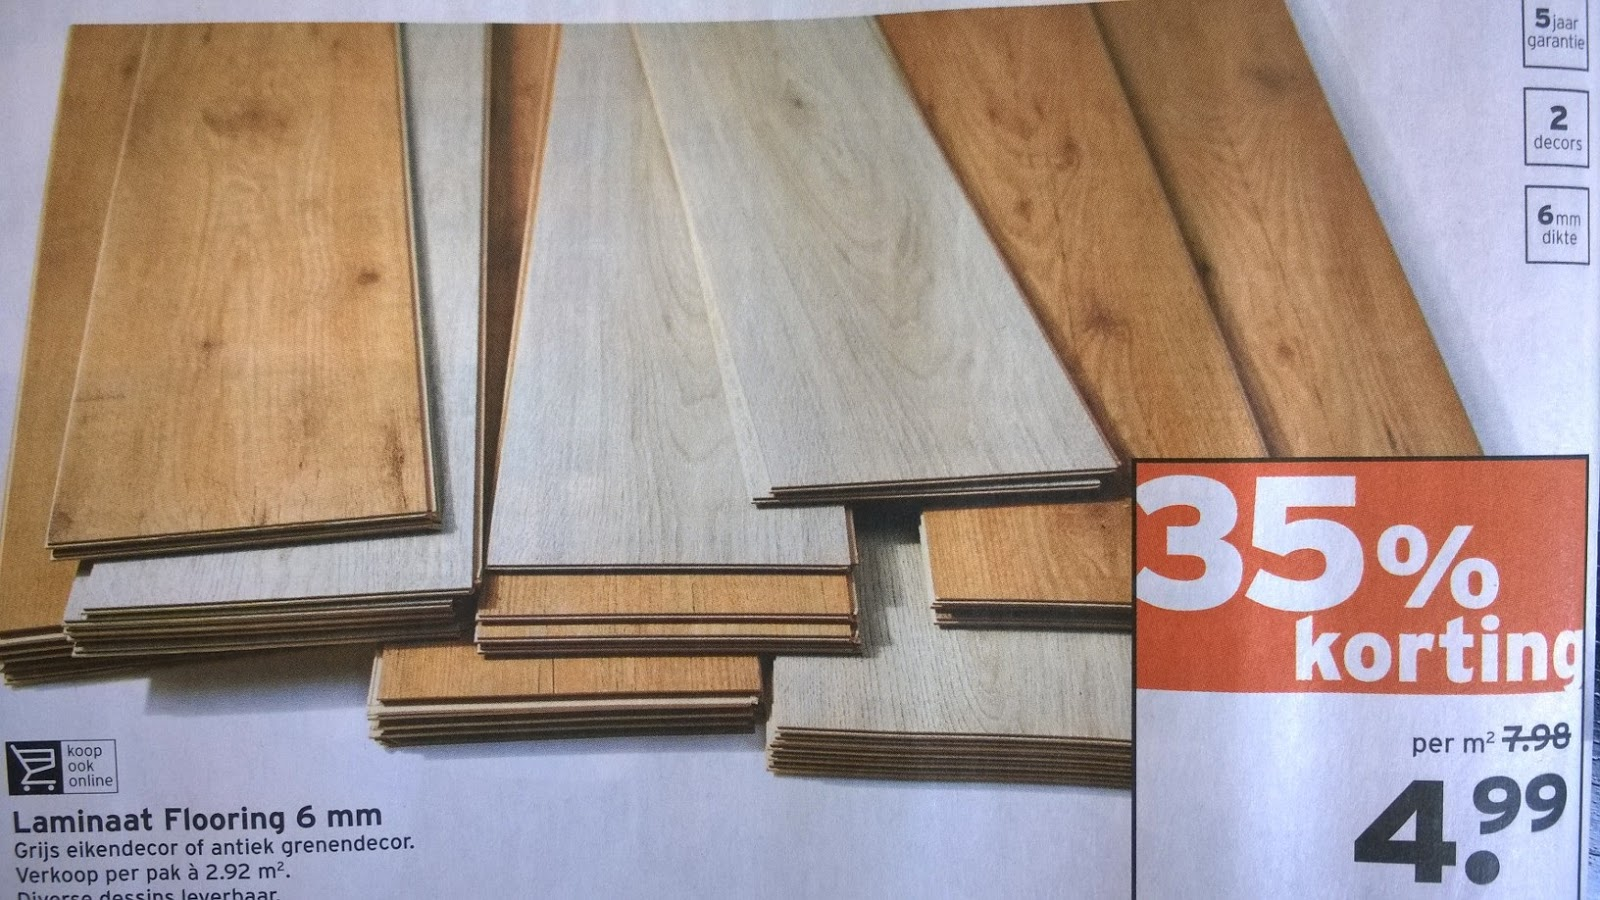 Gamma Laminaat Aanbieding : Gamma laminaat flooring voor u ac